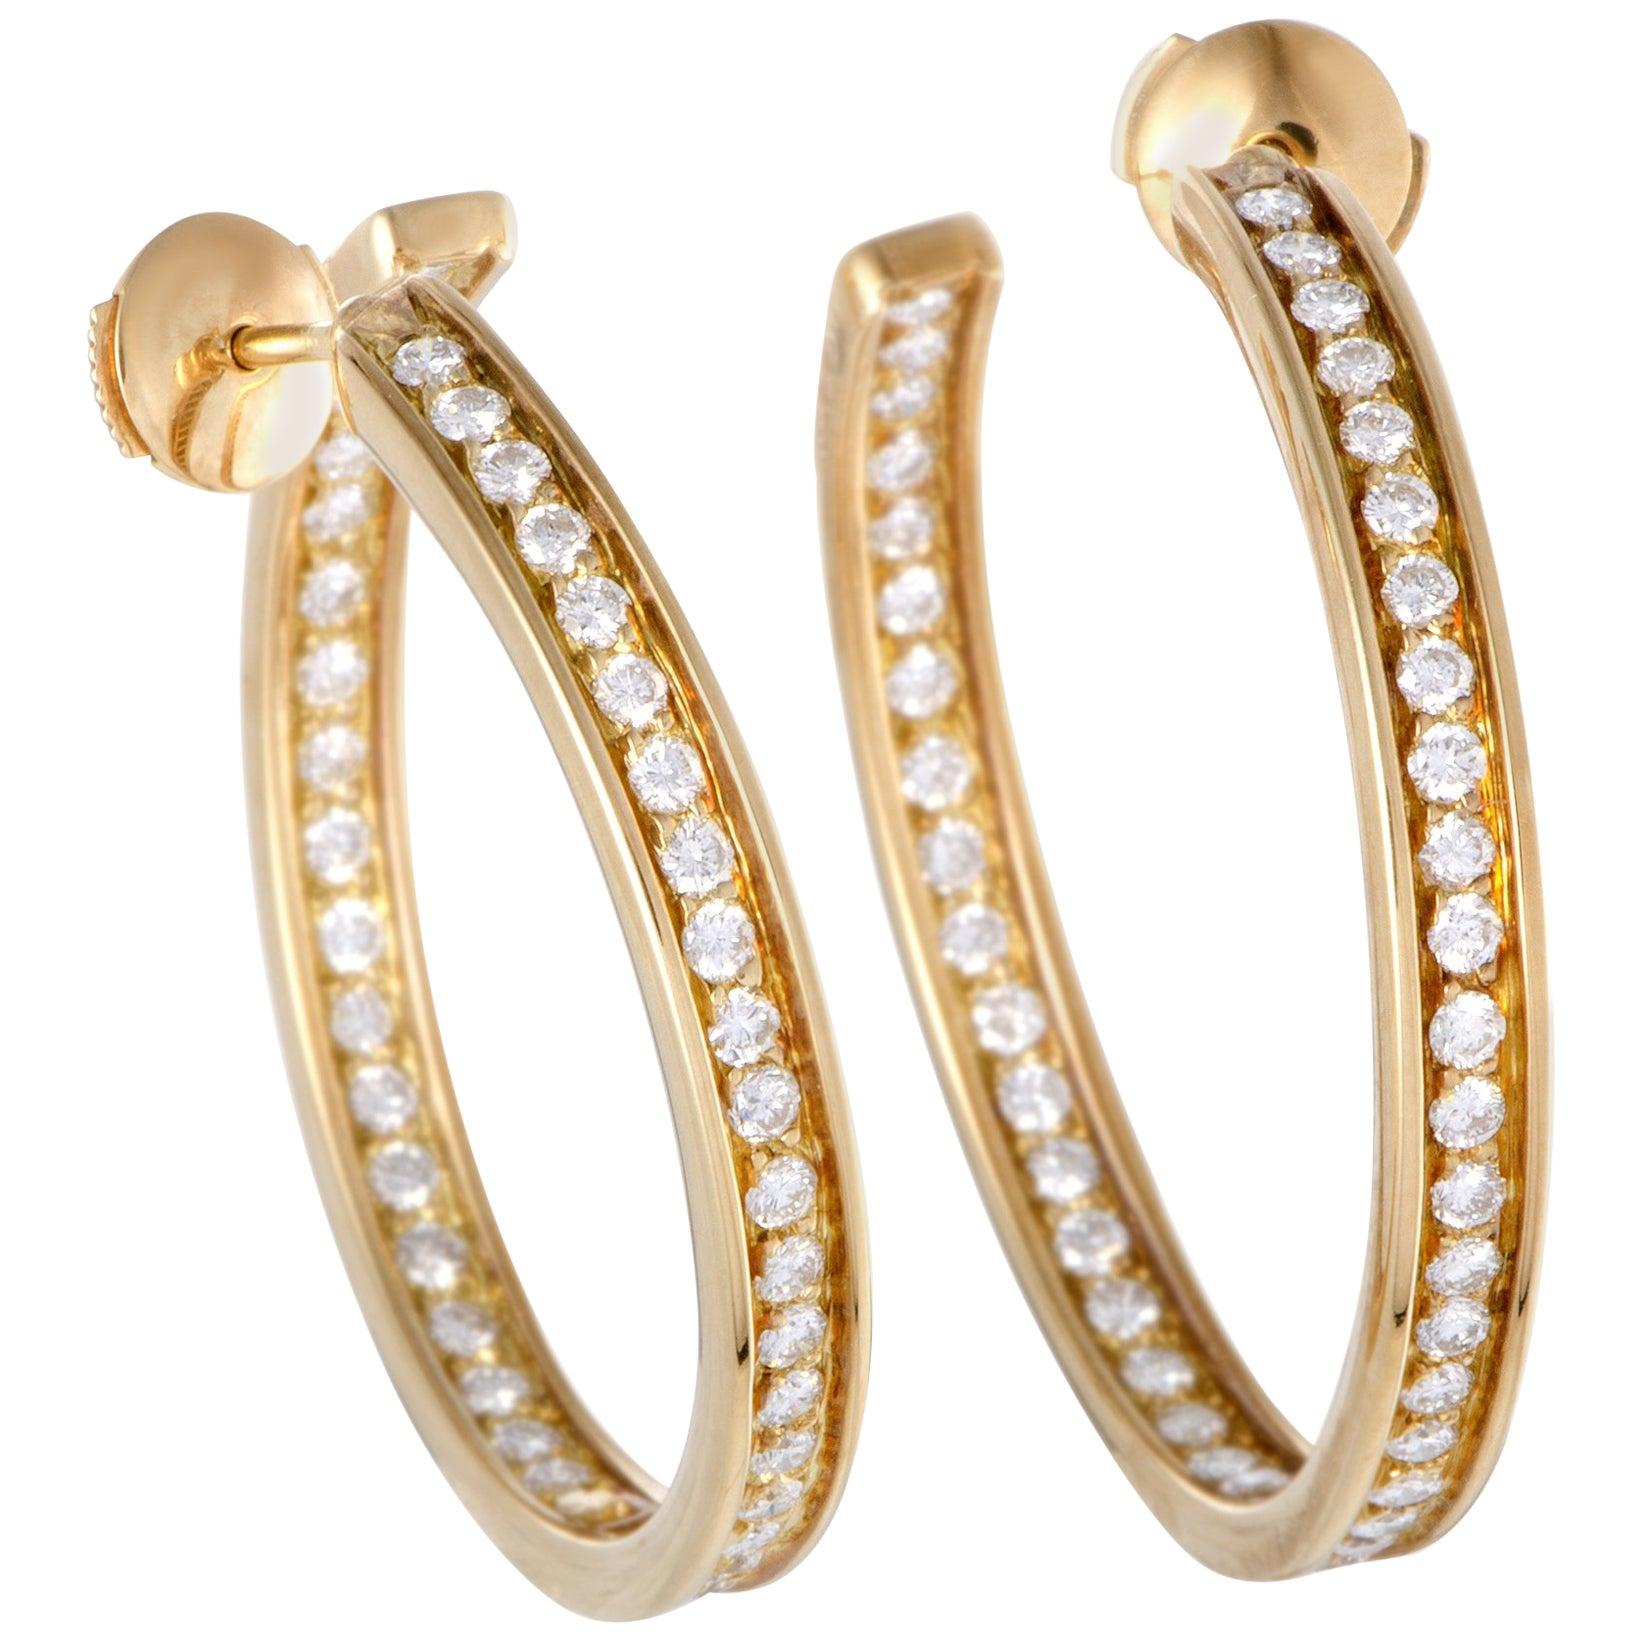 e65b3f9f5 Cartier 18 Karat Yellow Gold Diamond Inside Out Large Hoop Earrings at  1stdibs